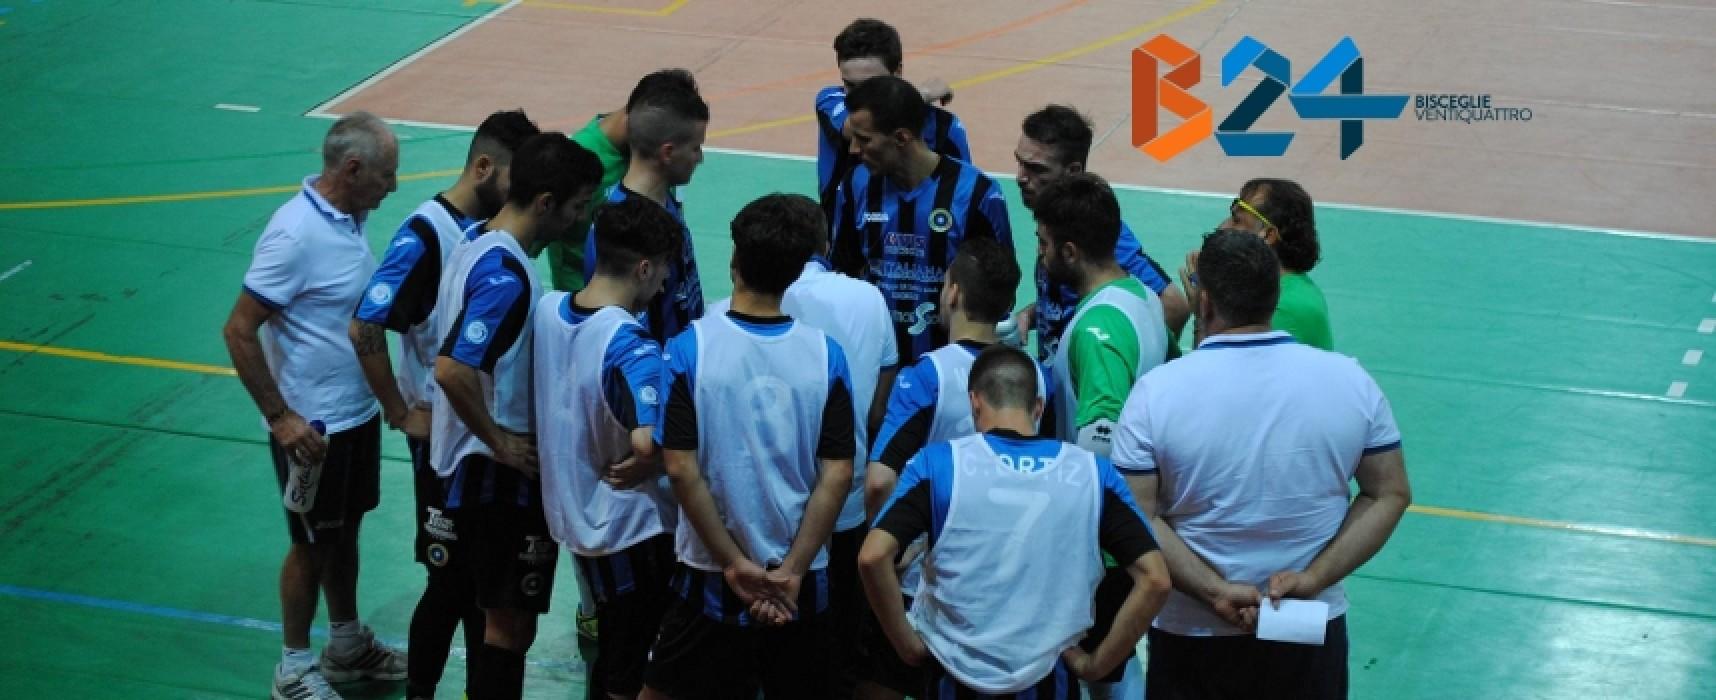 Diretta scritta: Futsal Bisceglie – Futsal Cisternino 3-1 FINALE